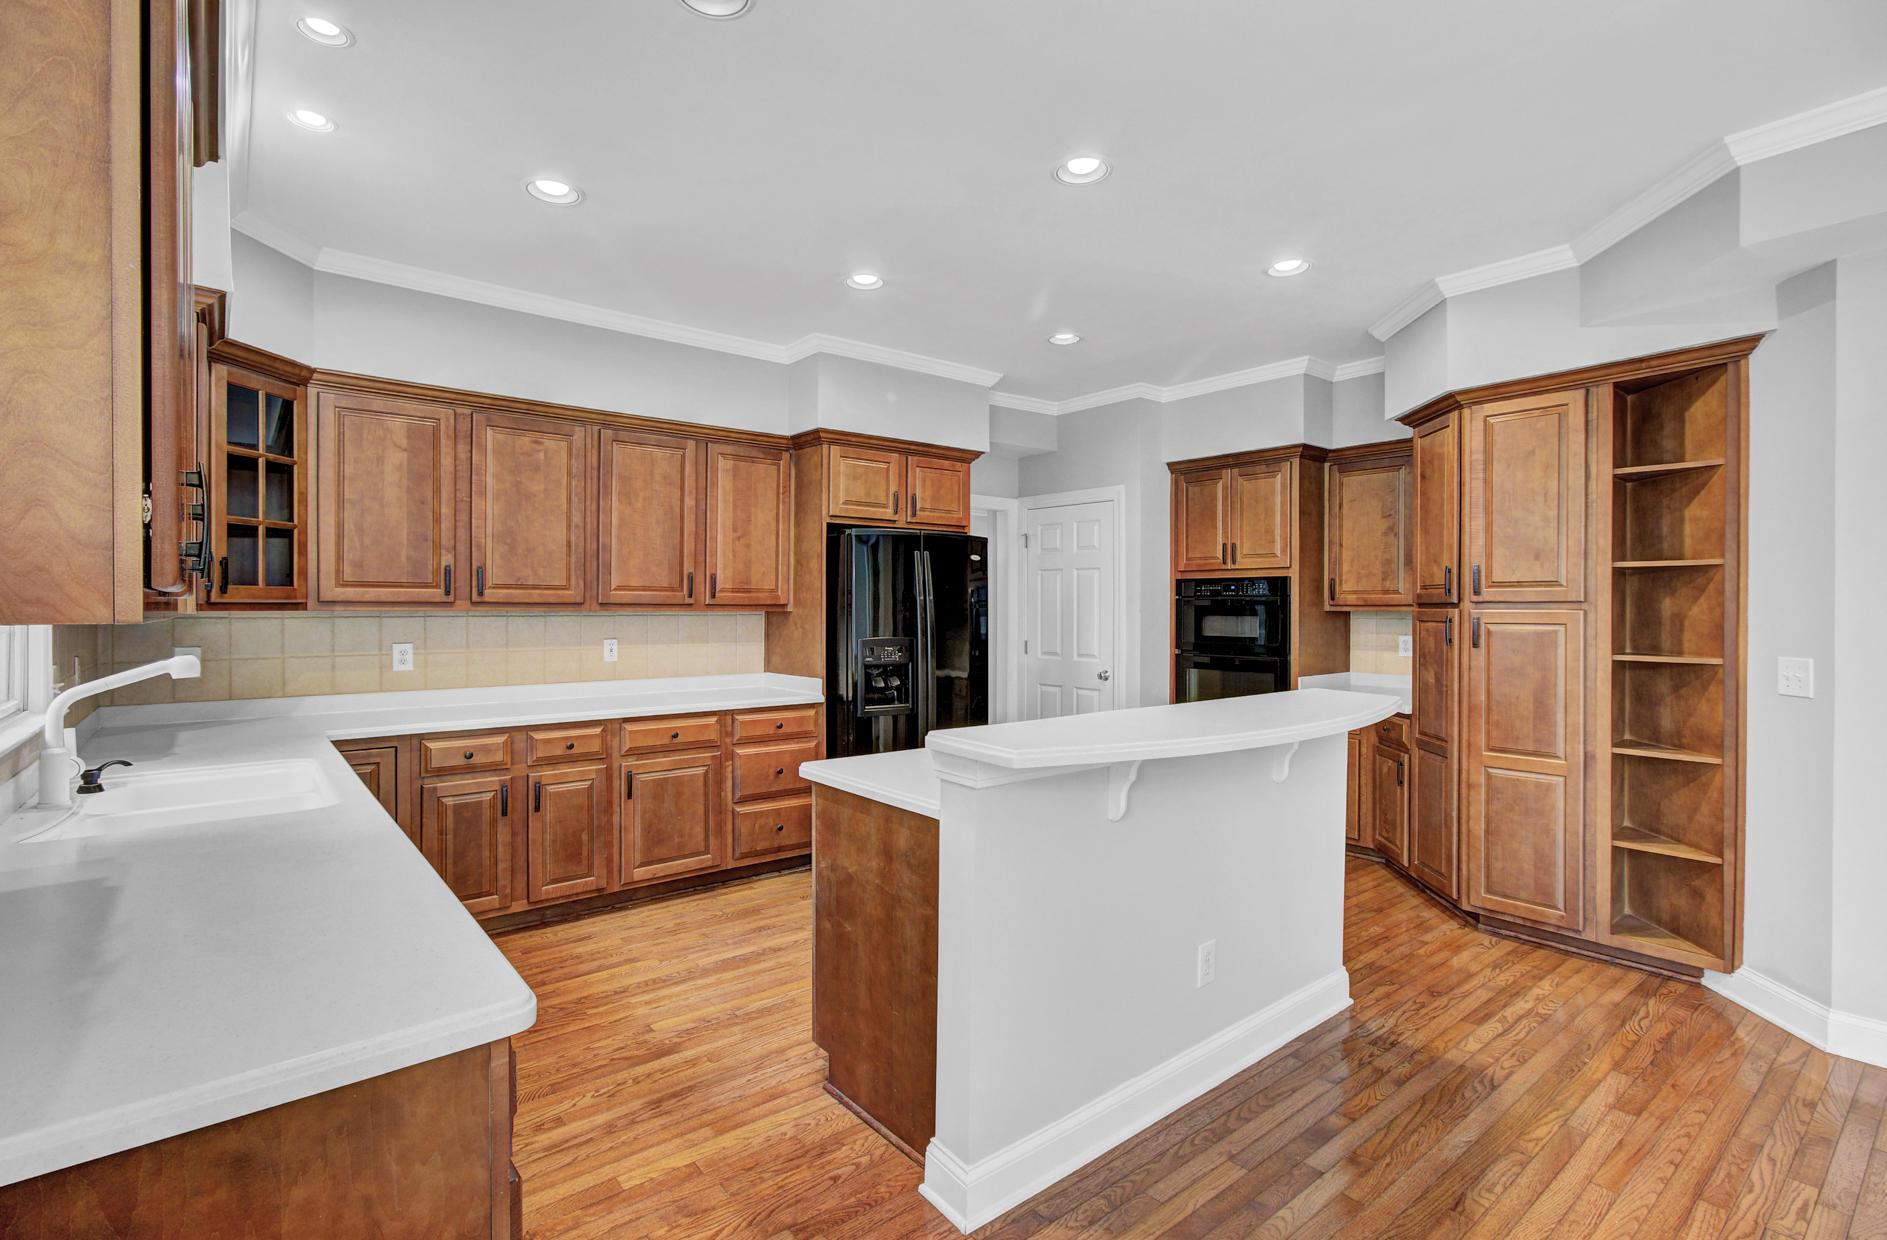 Dunes West Homes For Sale - 2321 Darts Cove, Mount Pleasant, SC - 16